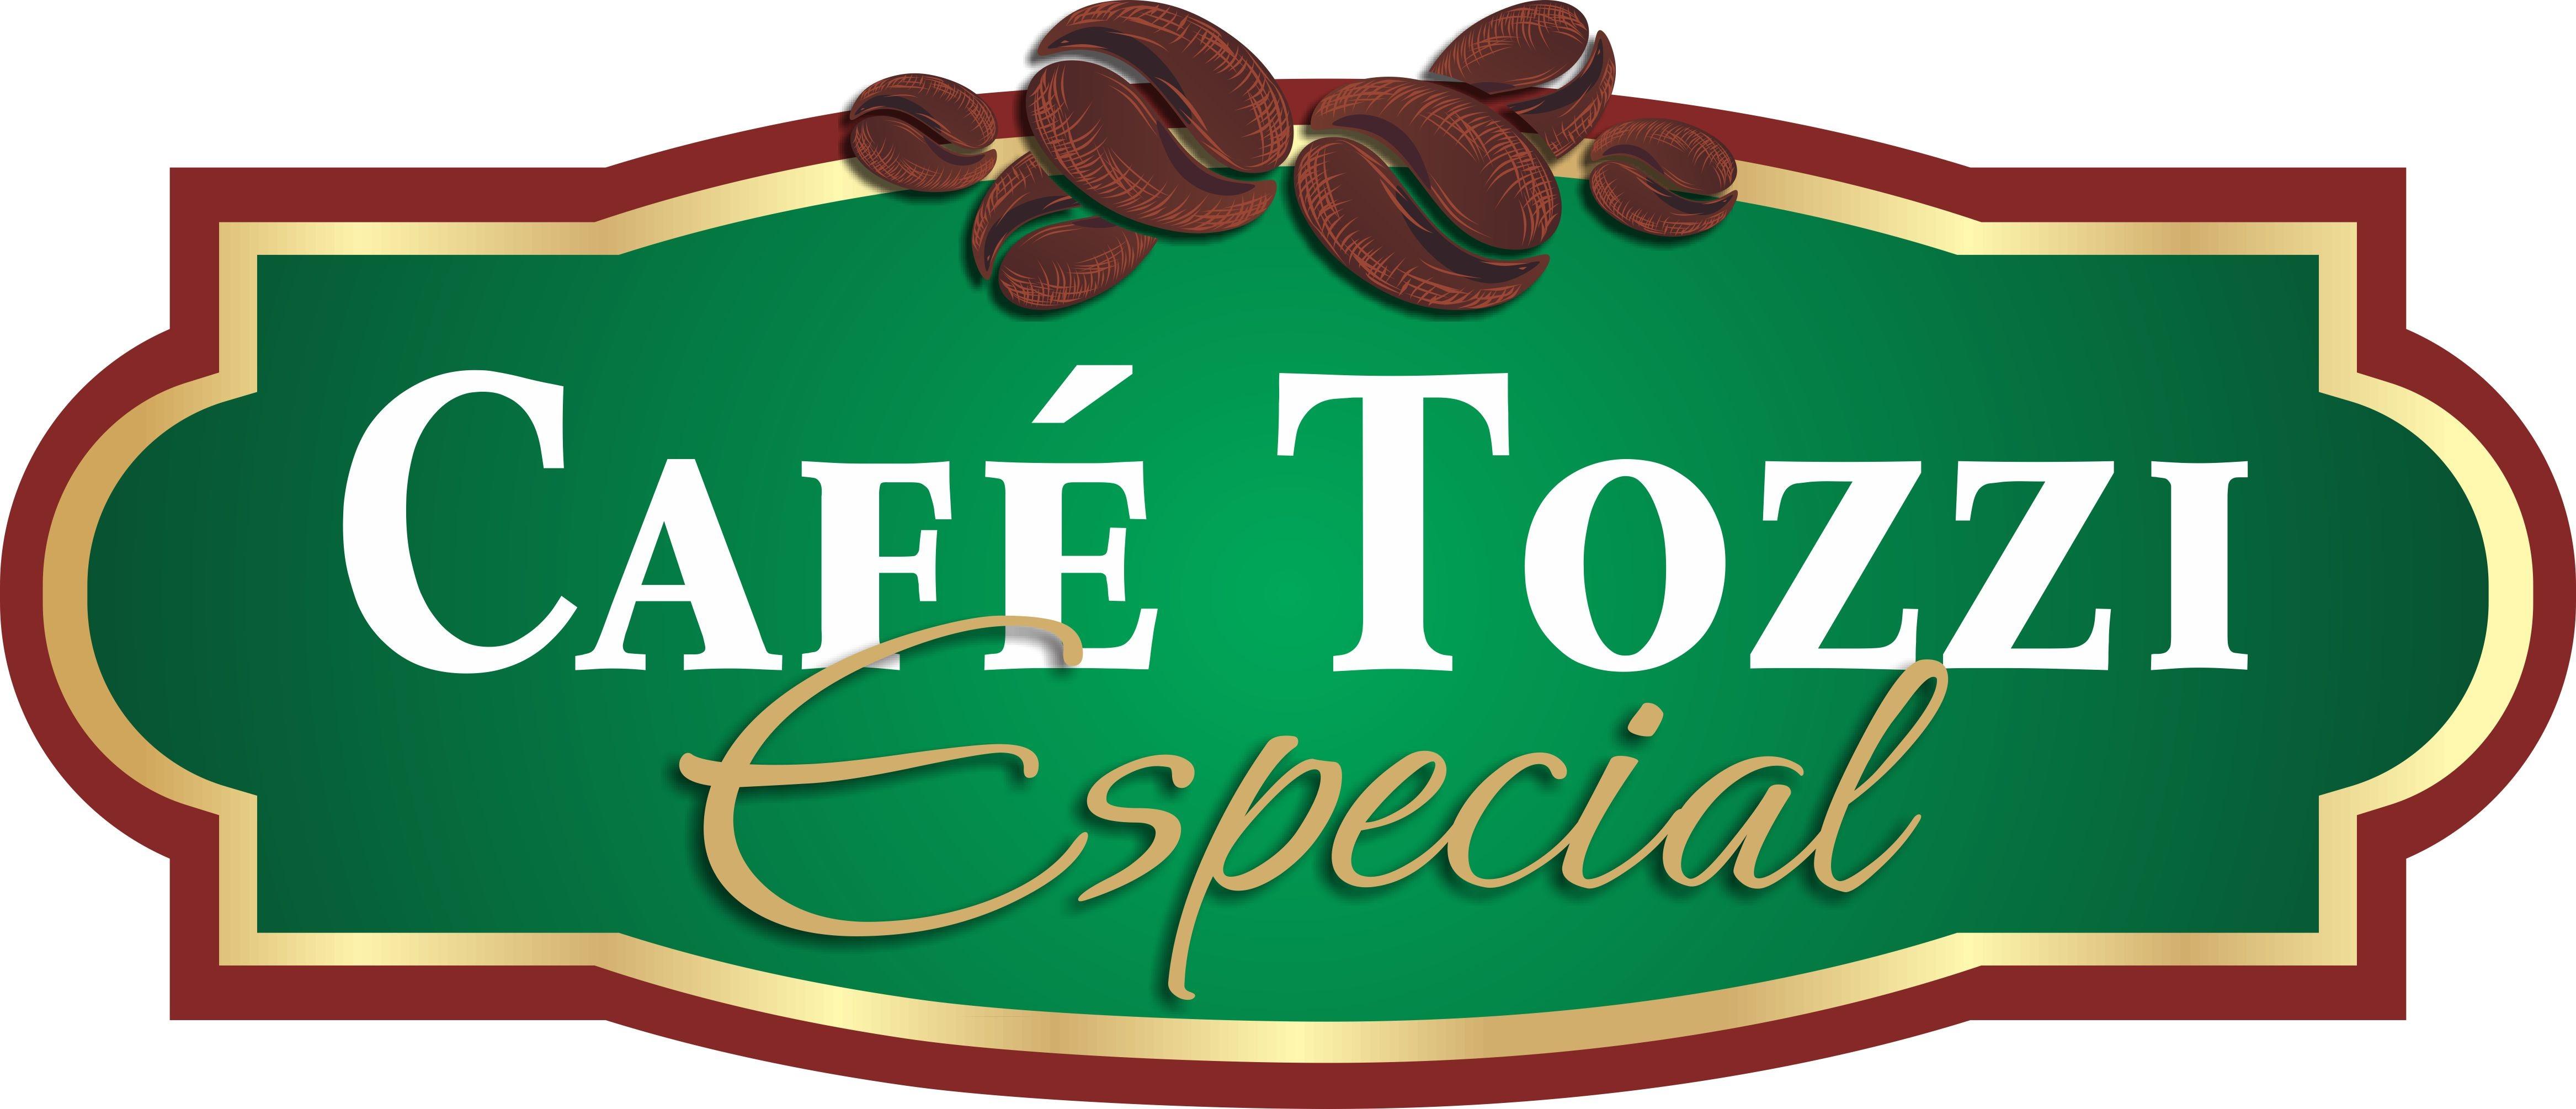 Café Tozzi